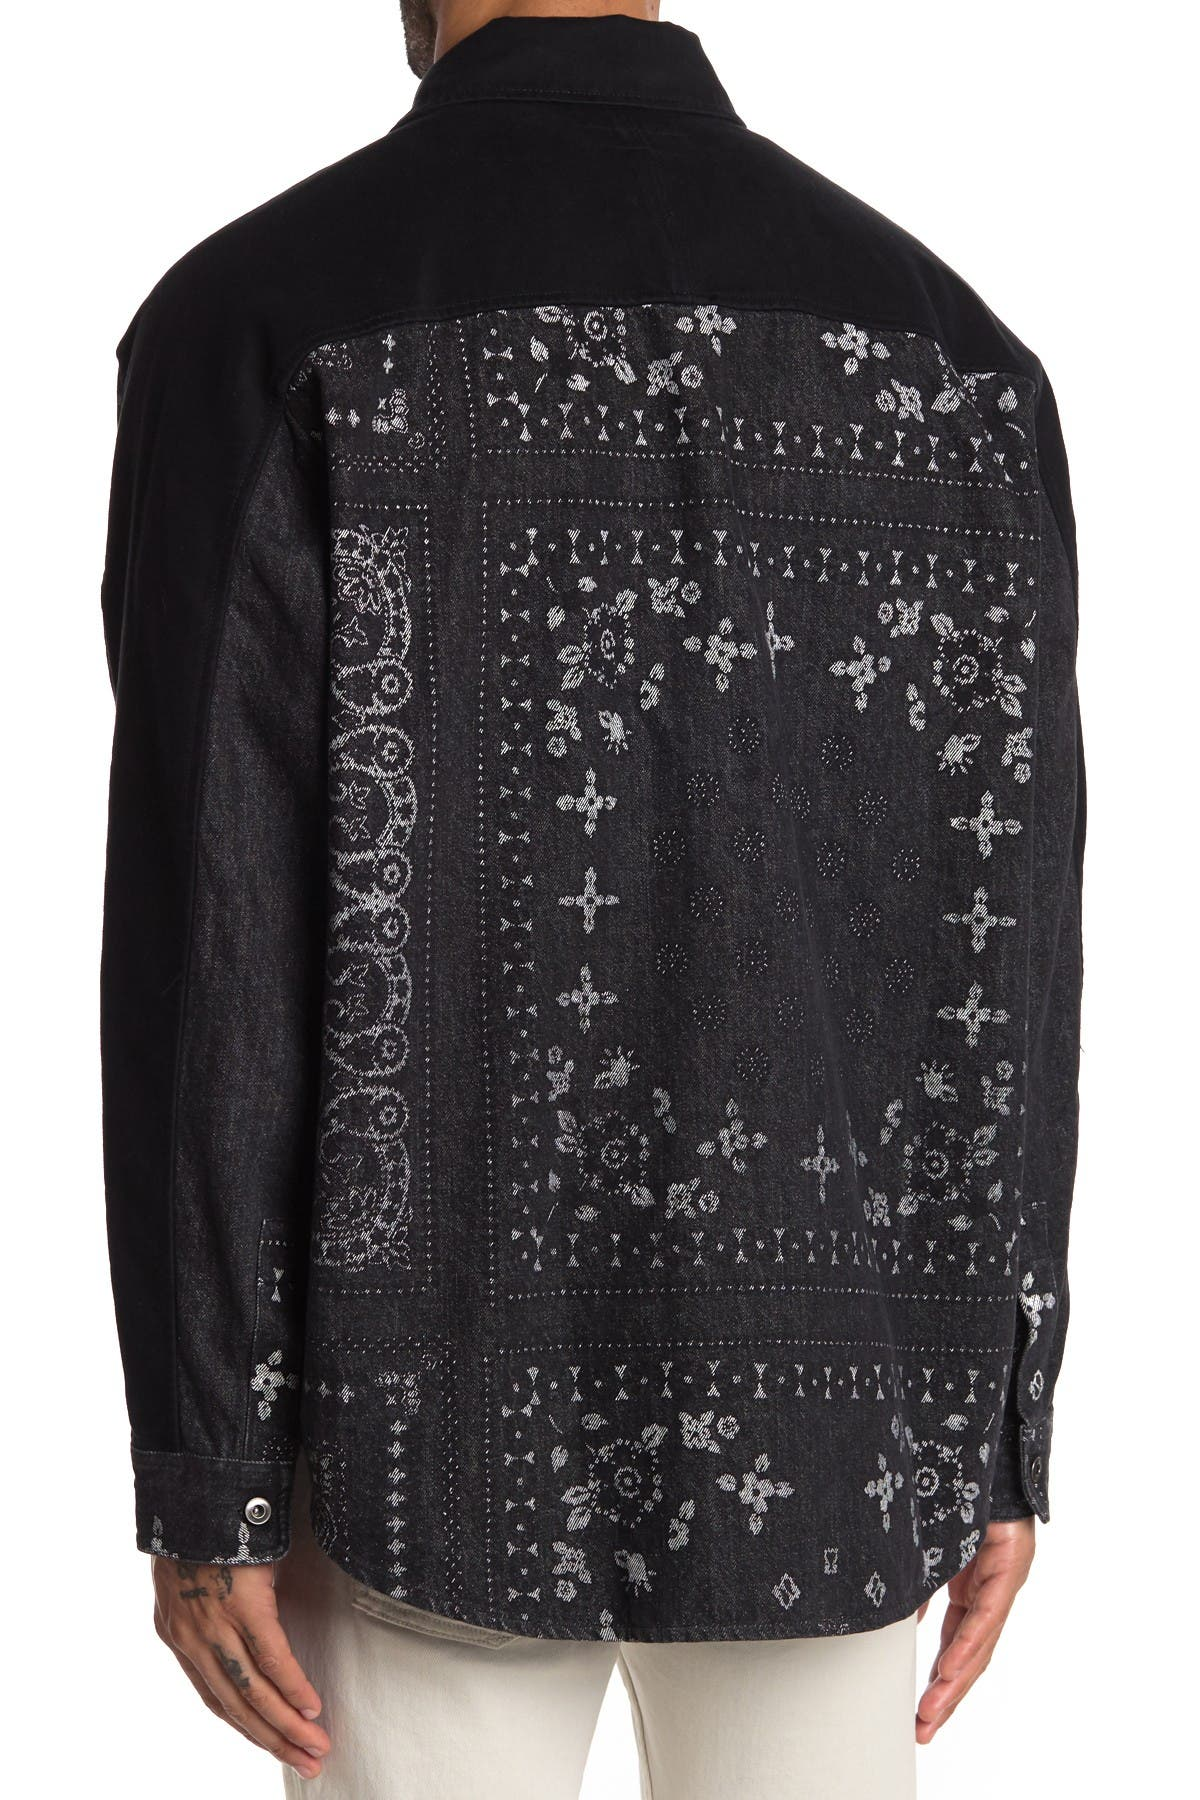 Image of HUDSON Jeans Bandana Print Long Sleeve Shirt